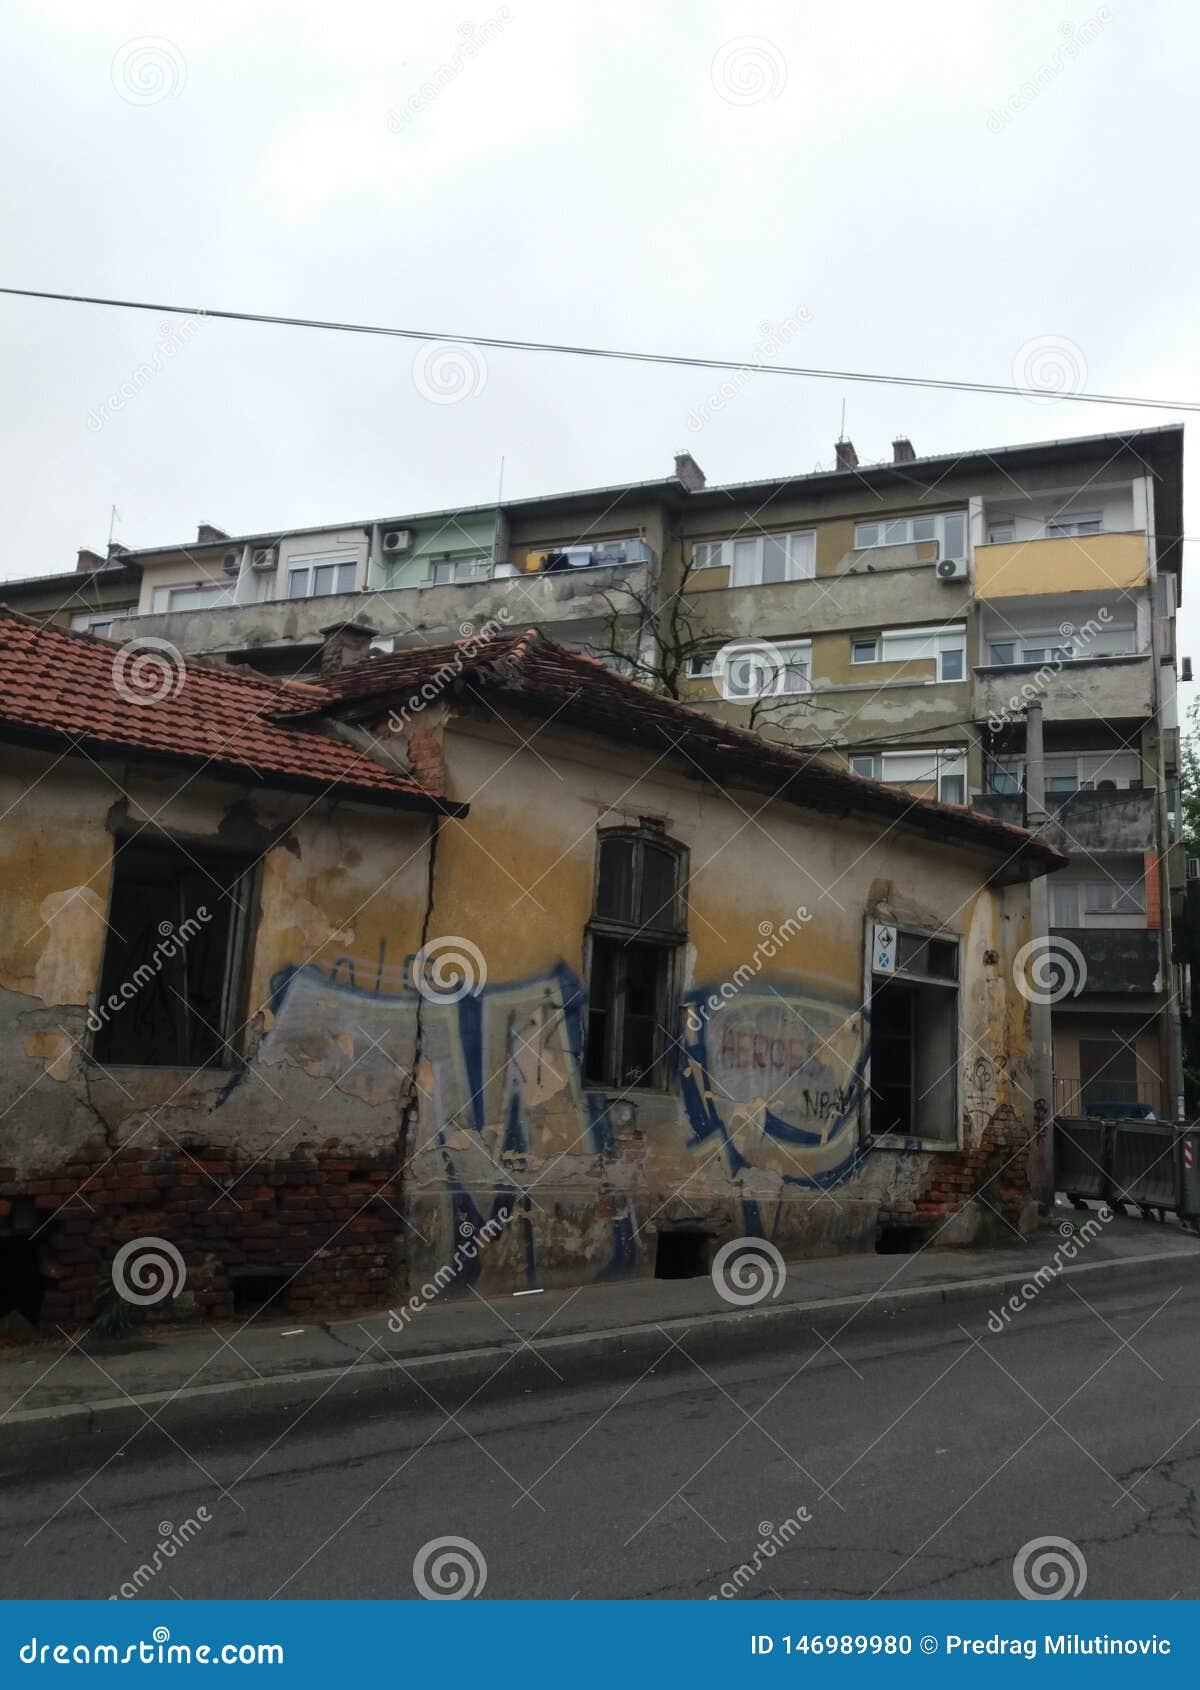 Belgrade - Vozdovac